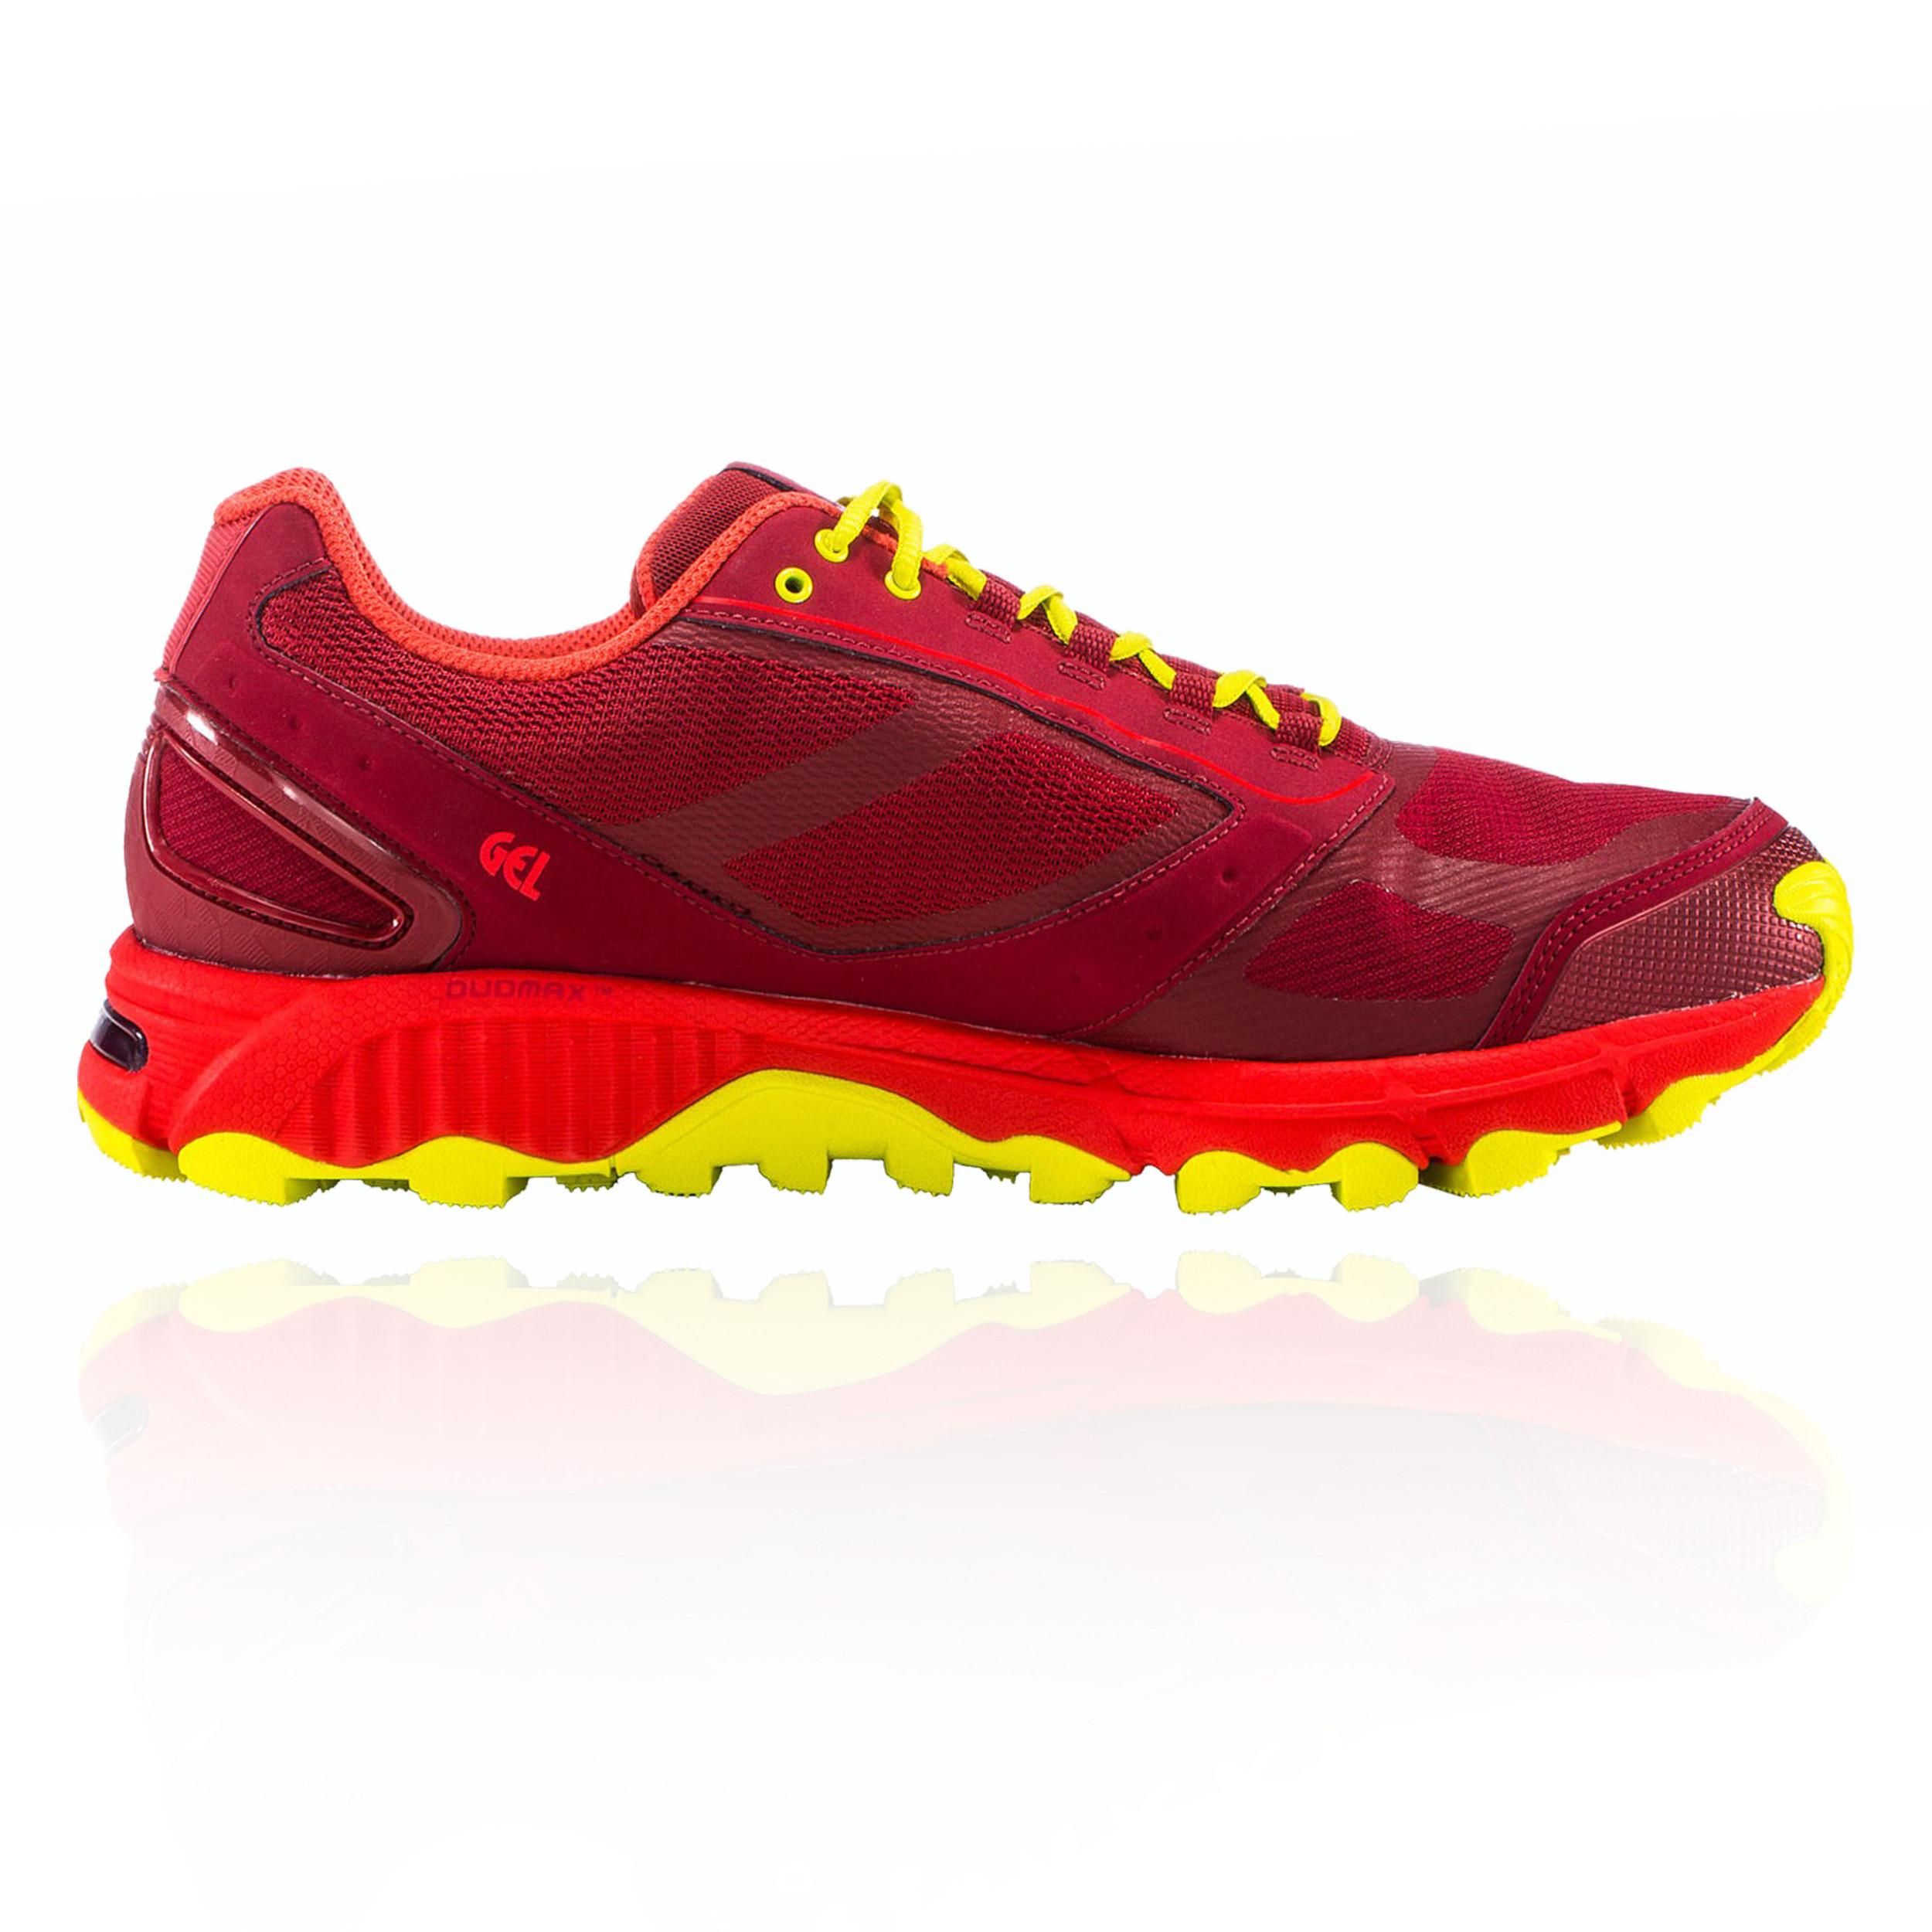 Gram Trainers Mens Trail Haglofs Shoes Running Red Gravel Sneakers cS3RL4q5Aj